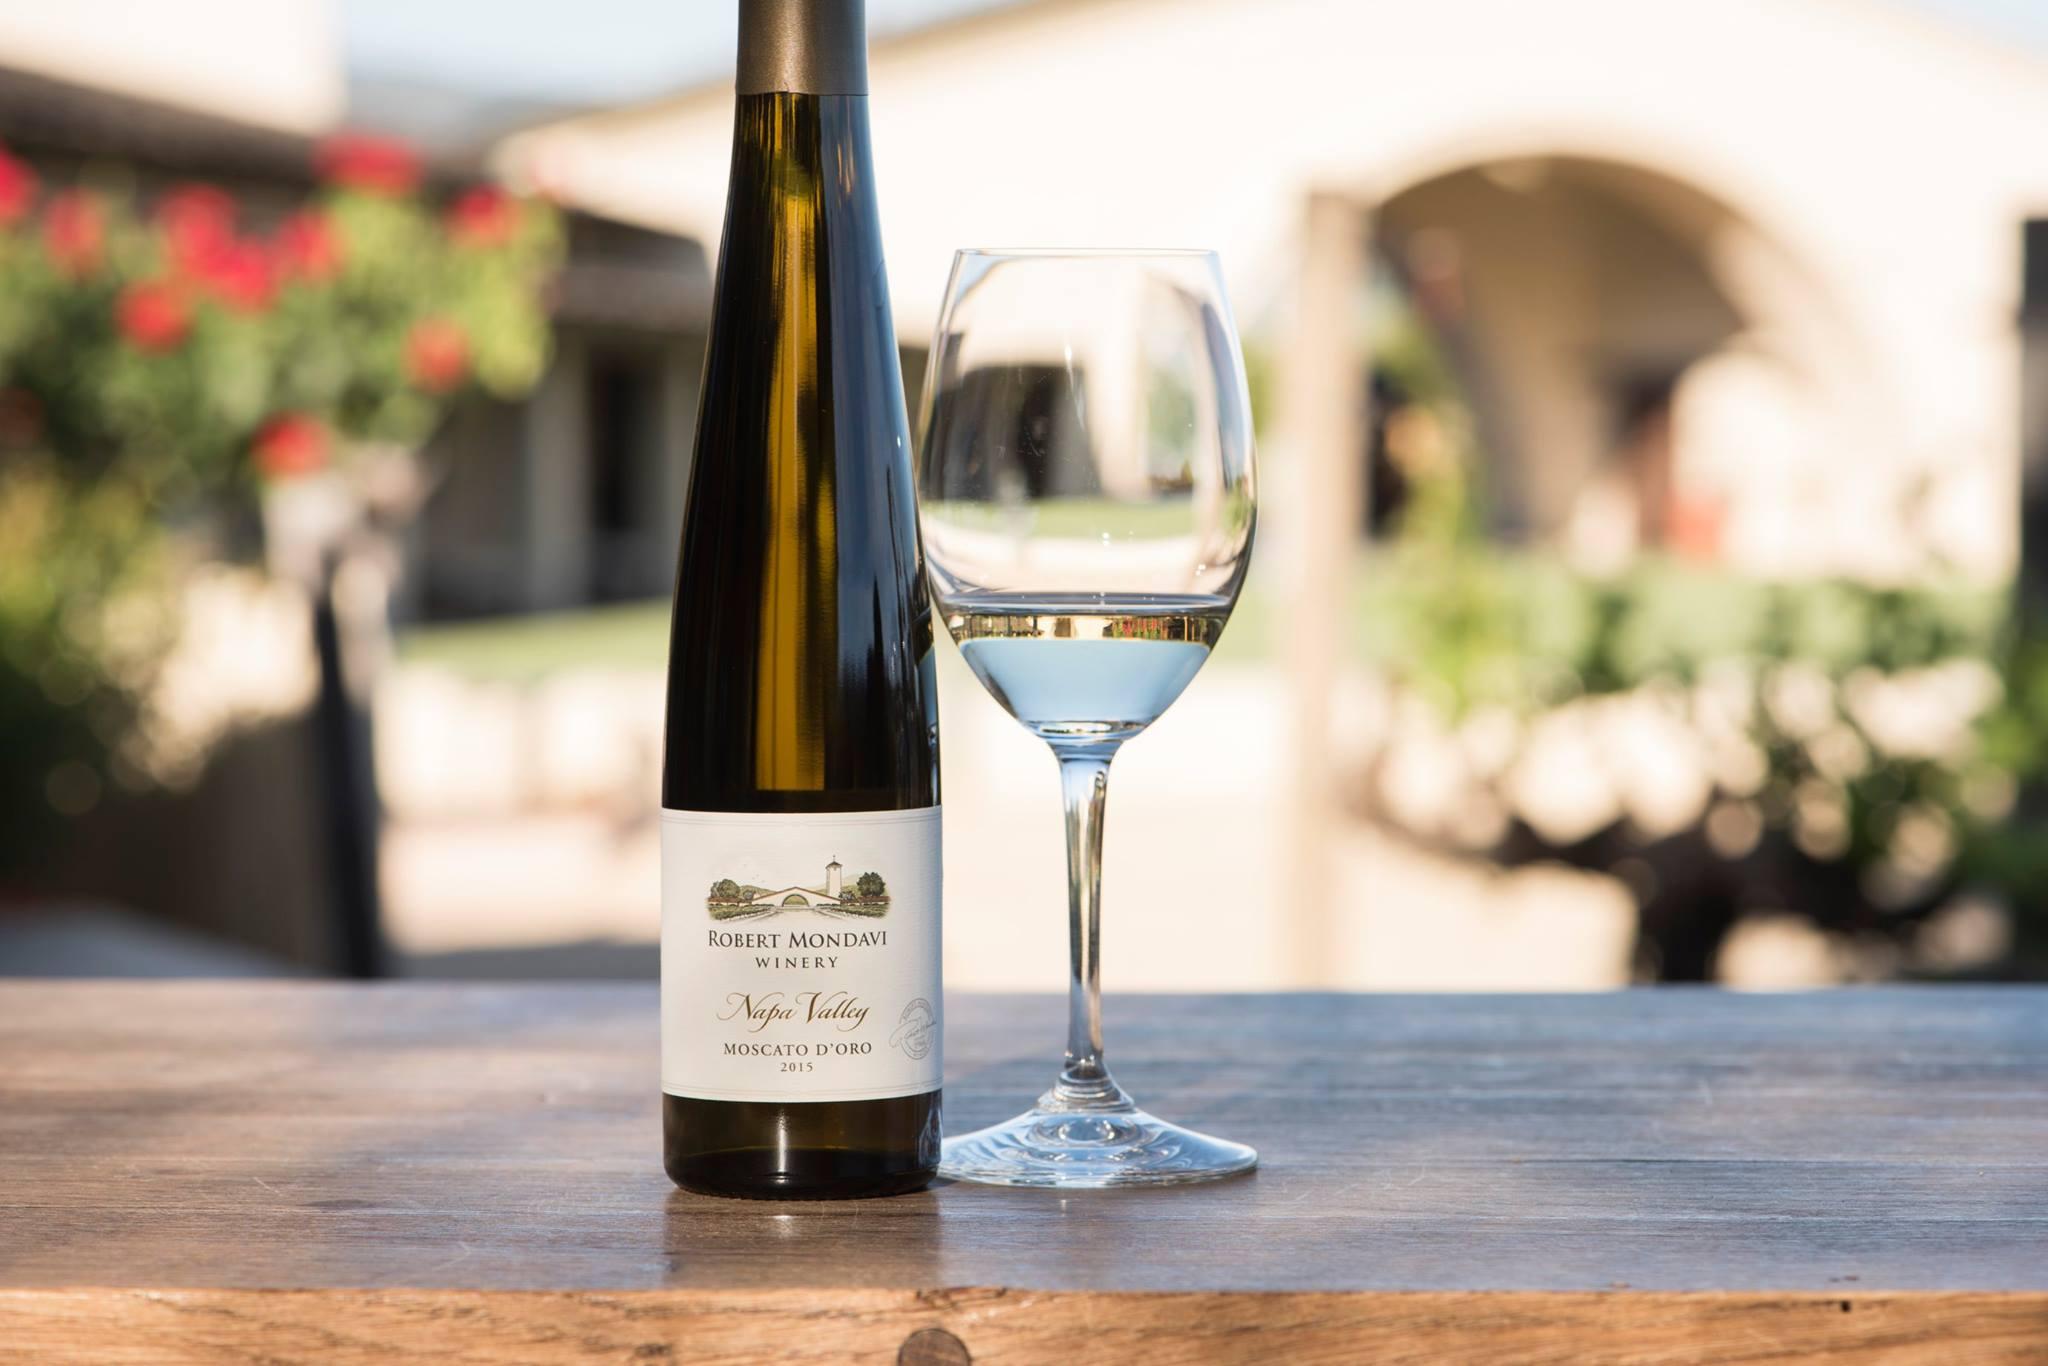 Enjoy one of Robert Mondavi's Wine by renting a charter bus.